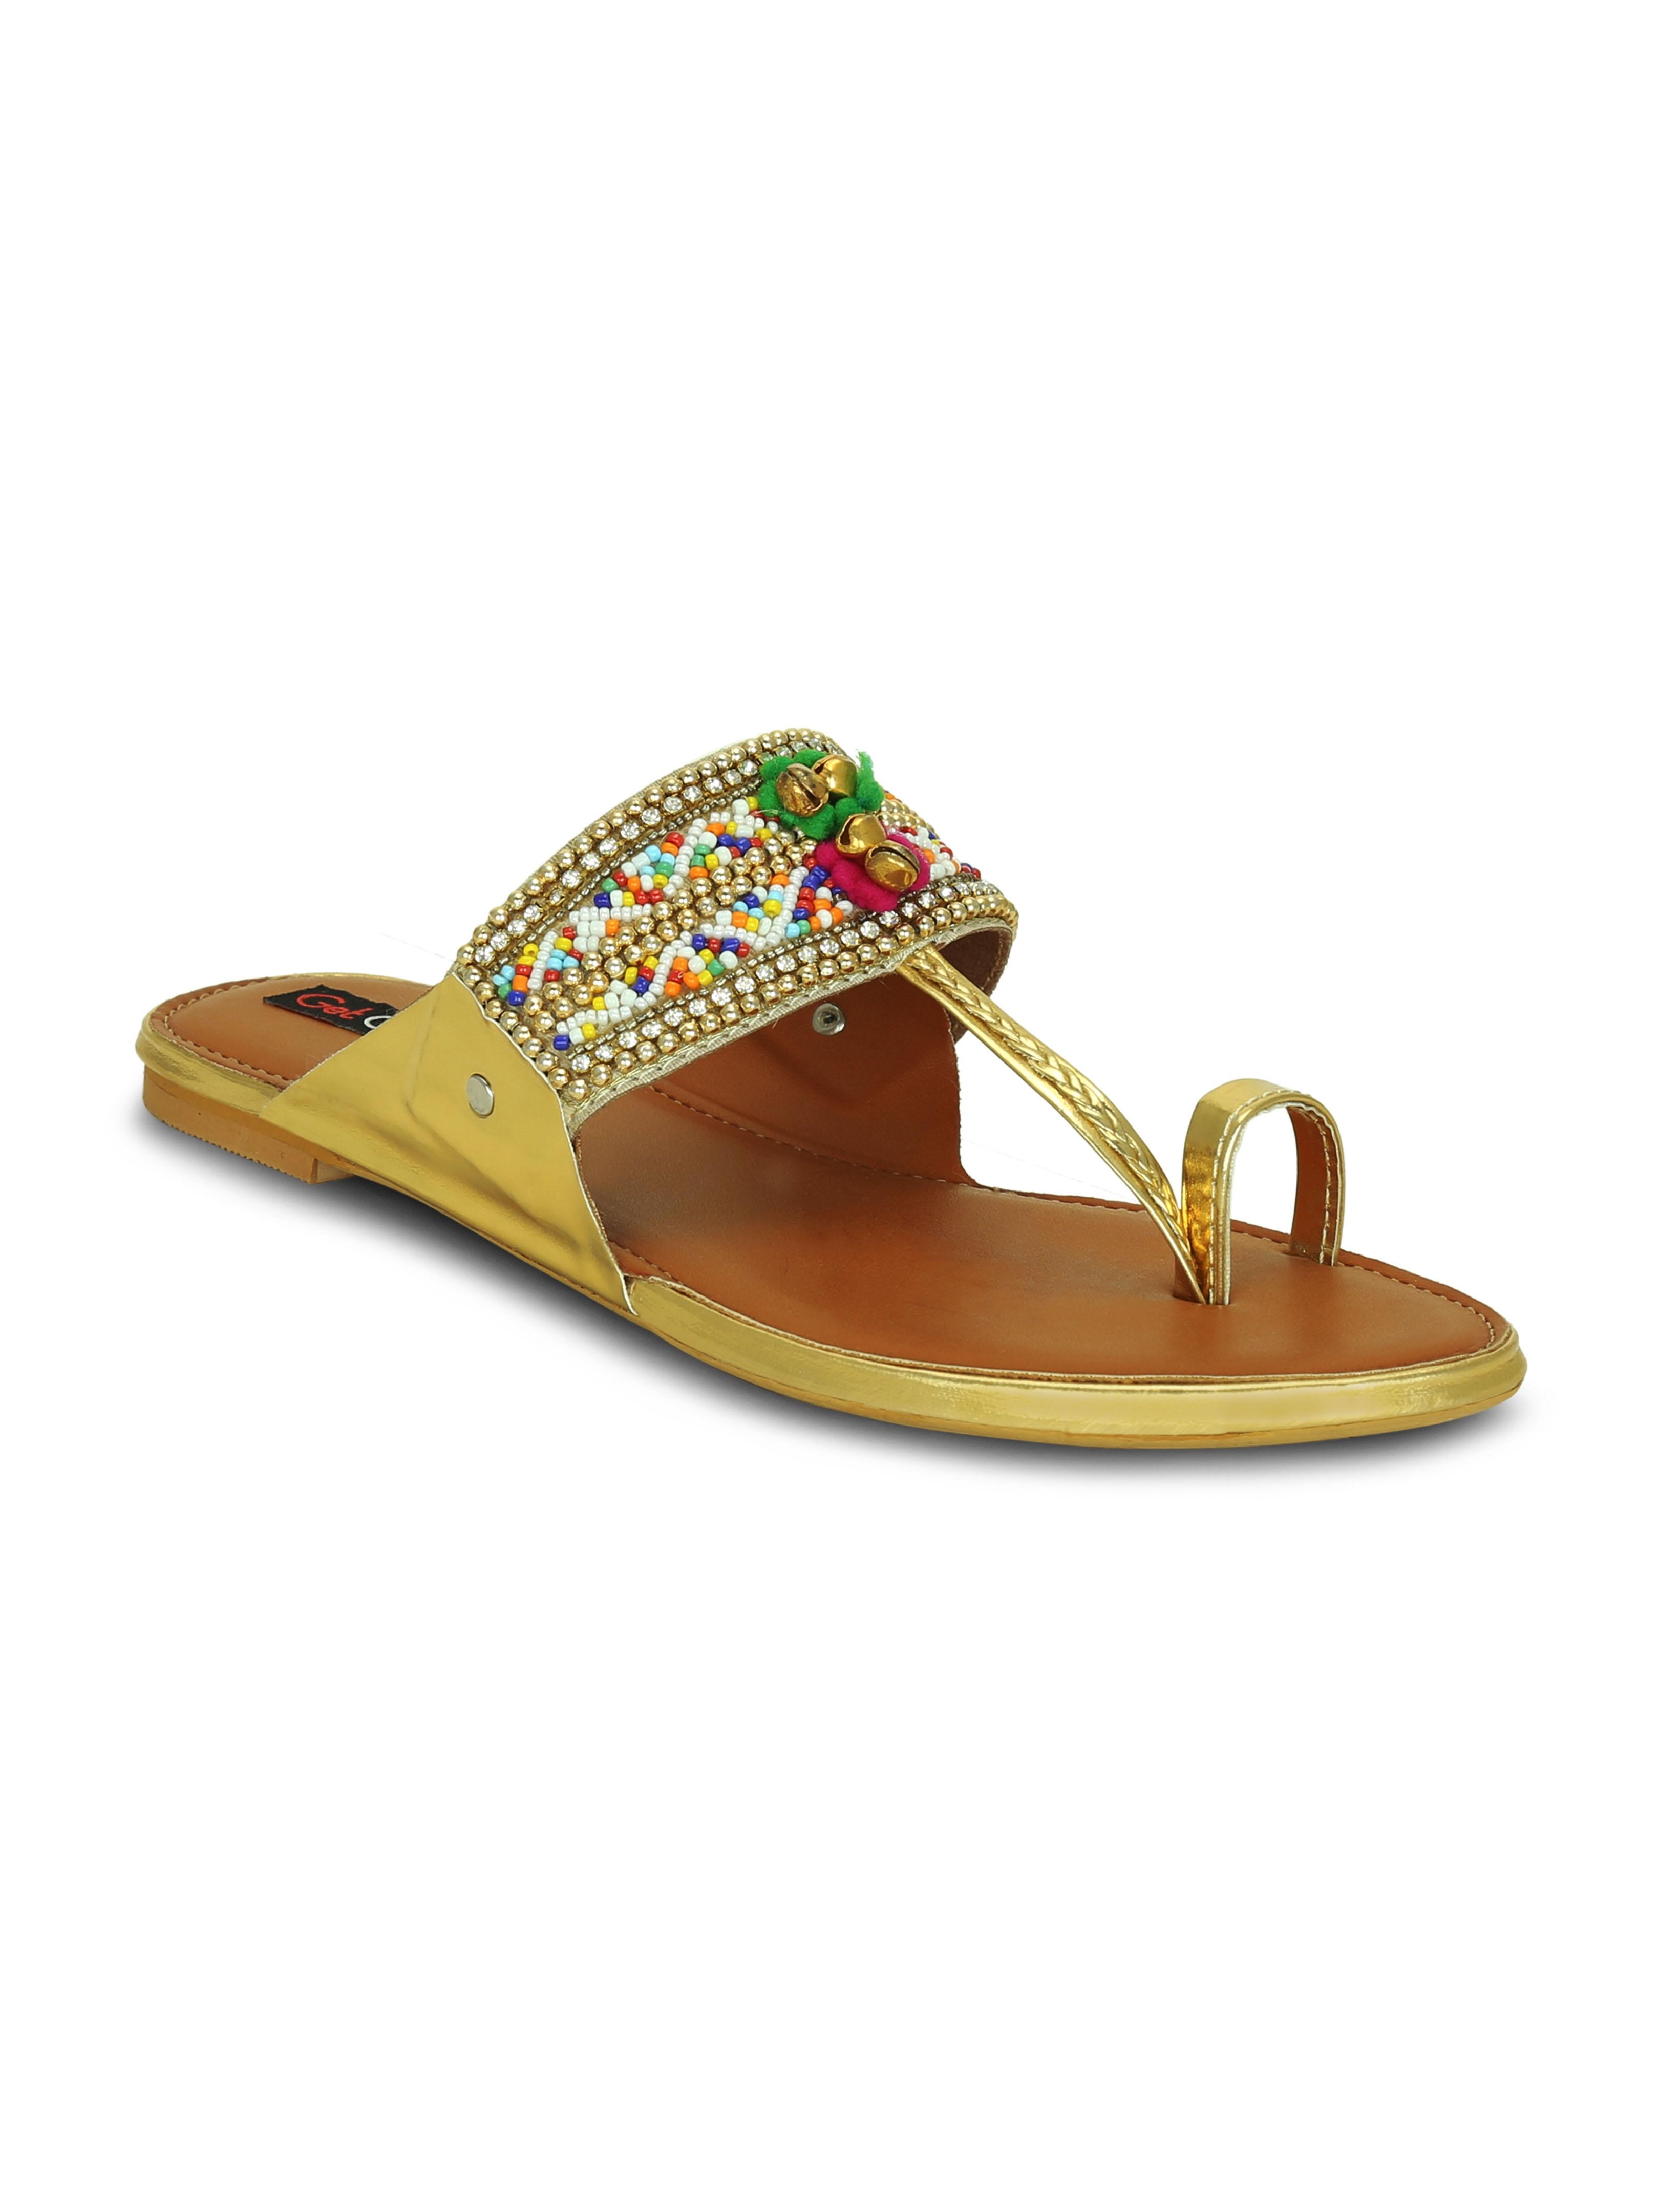 63a1d314bc2a22 Shoe Artificial Flowers And Plants - Buy Shoe Artificial Flowers And Plants  online in India